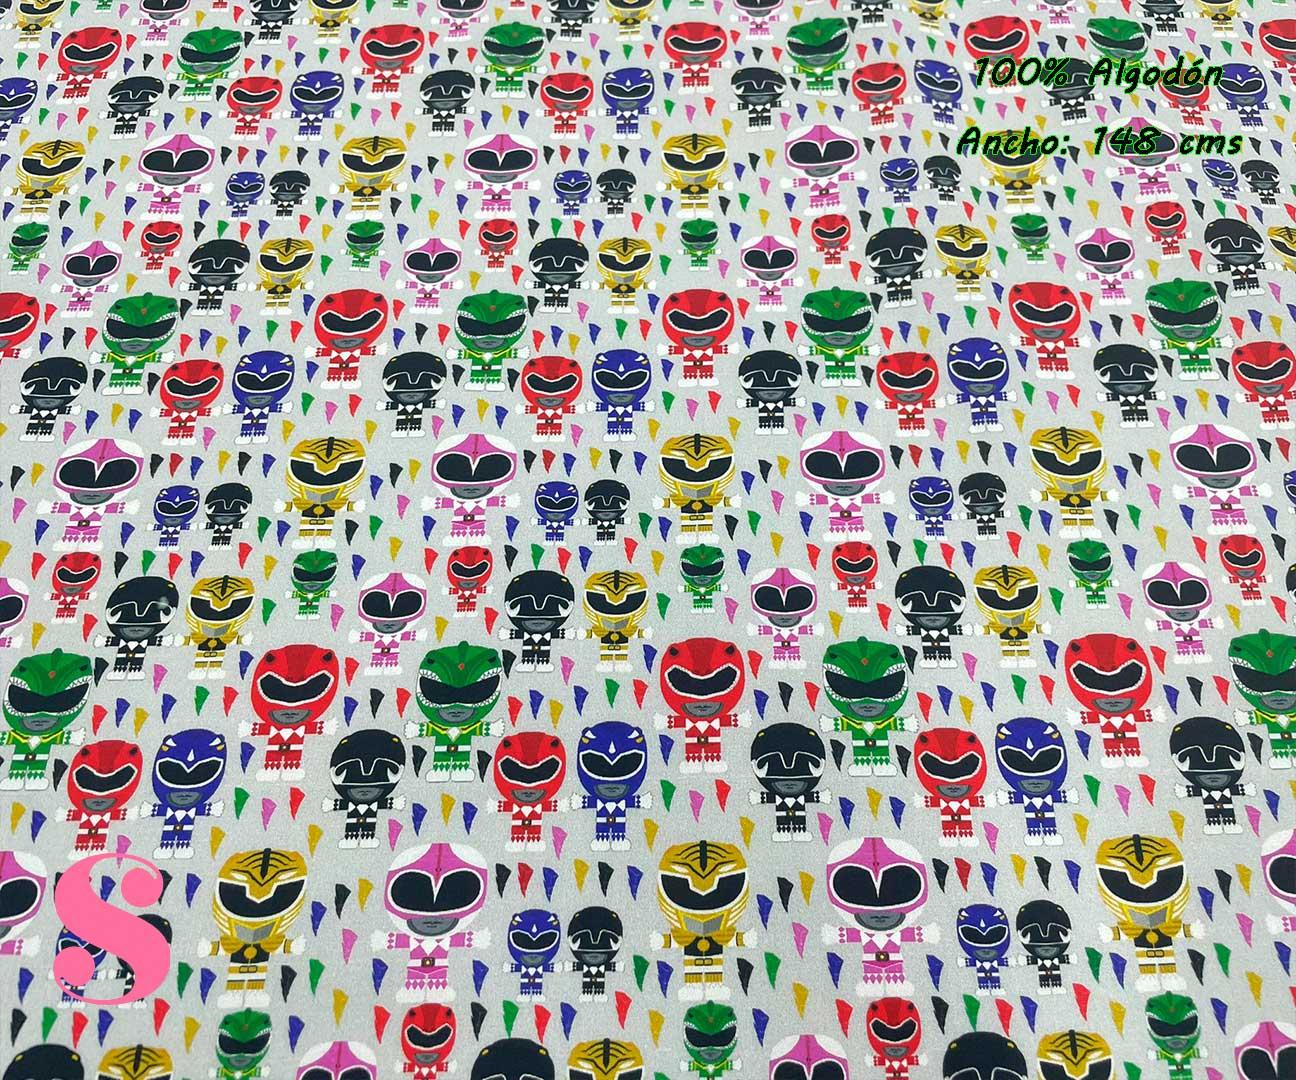 4-telas-disney,telas-infantiles,telas-frikis,estampados-disney,estampados-disney,tela-power-ranger,Tejido Estampado Mini Power Rangers